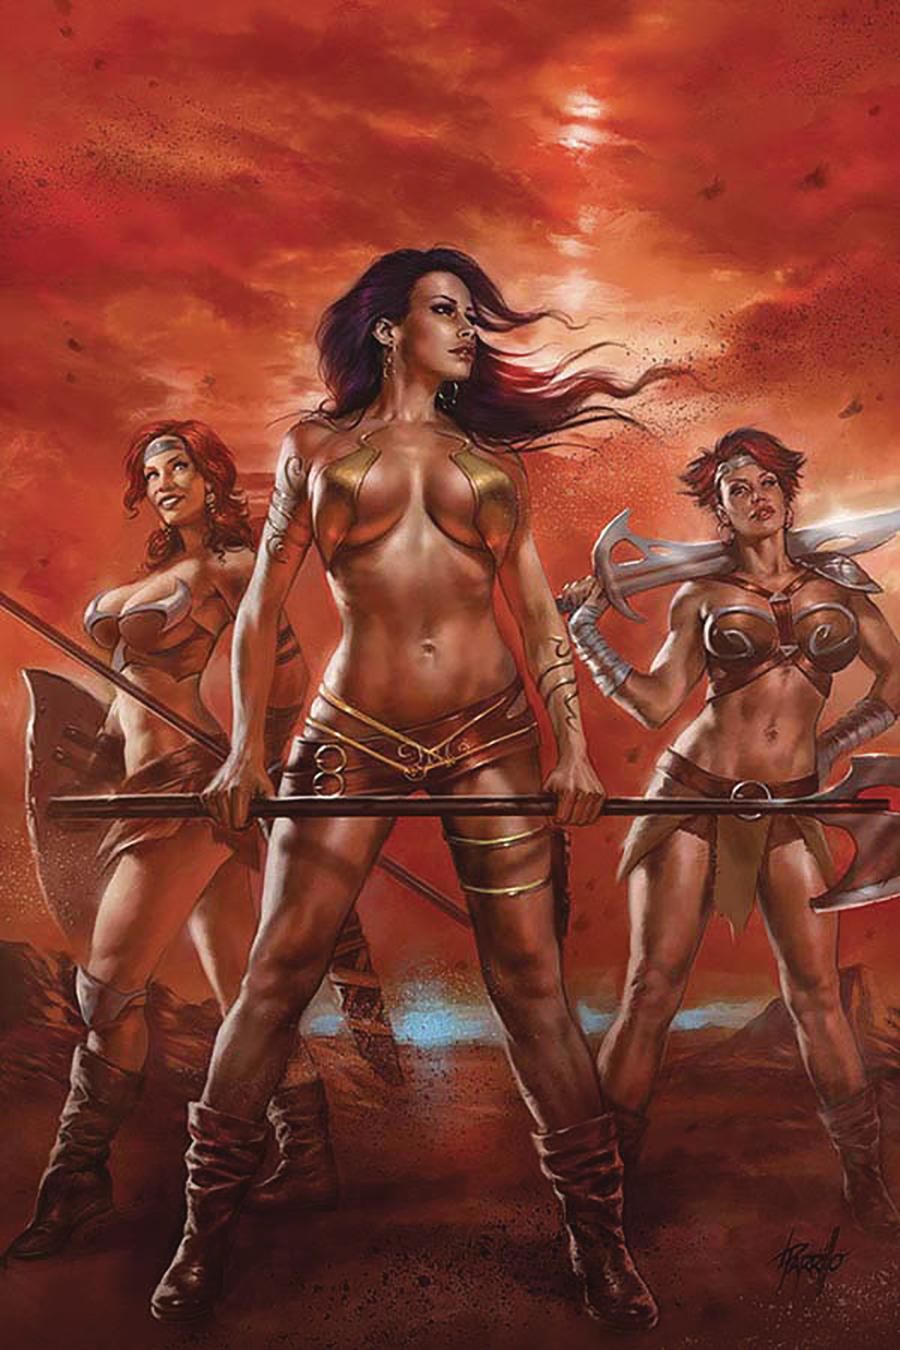 Dejah Thoris Vol 3 #2 Cover S Limited Edition Lucio Parrillo Virgin Cover